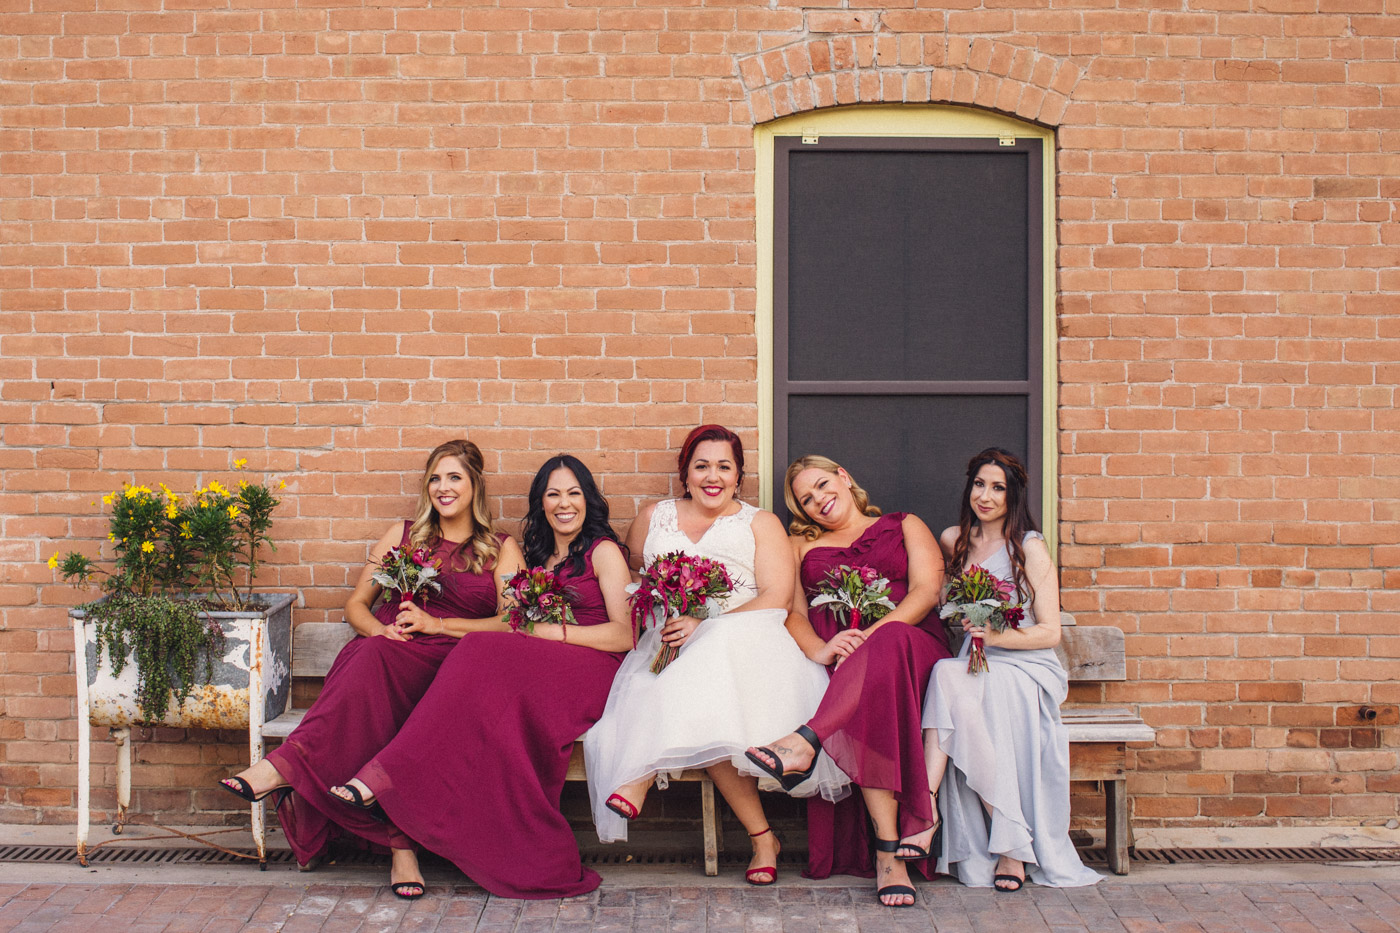 cute-bride-and-bridesmaids-photo